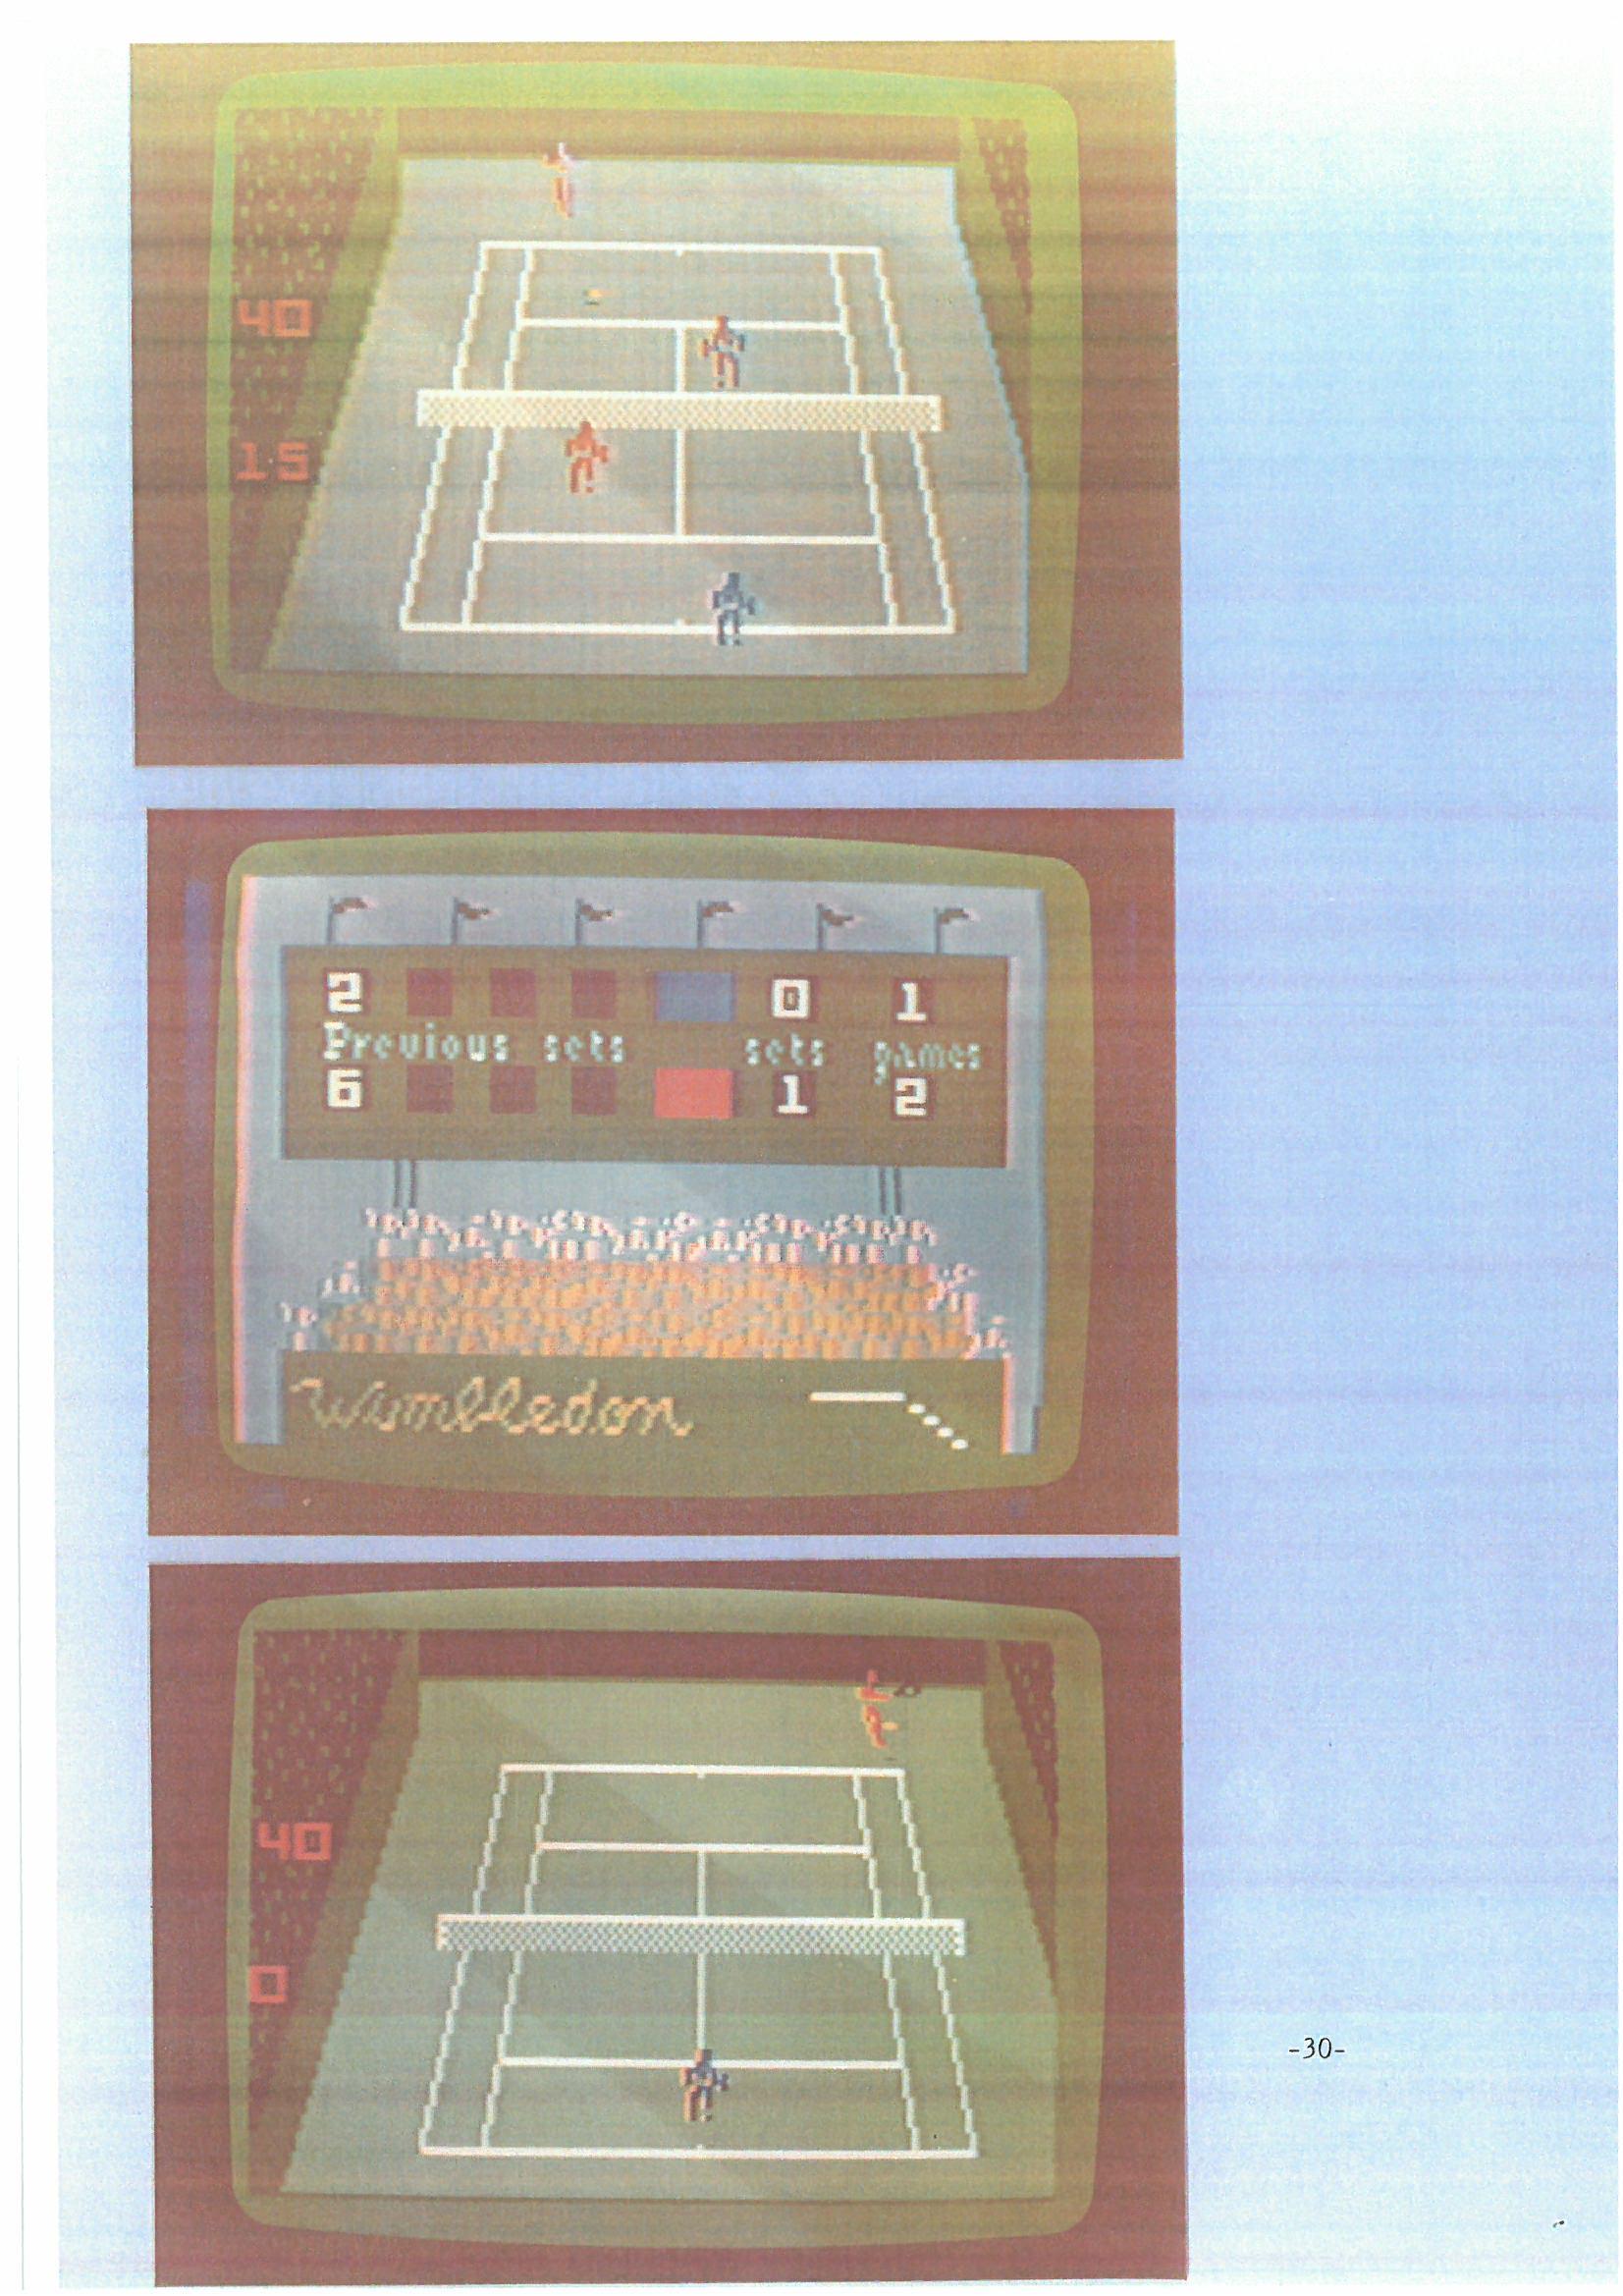 Championship Tennis for Intellivision